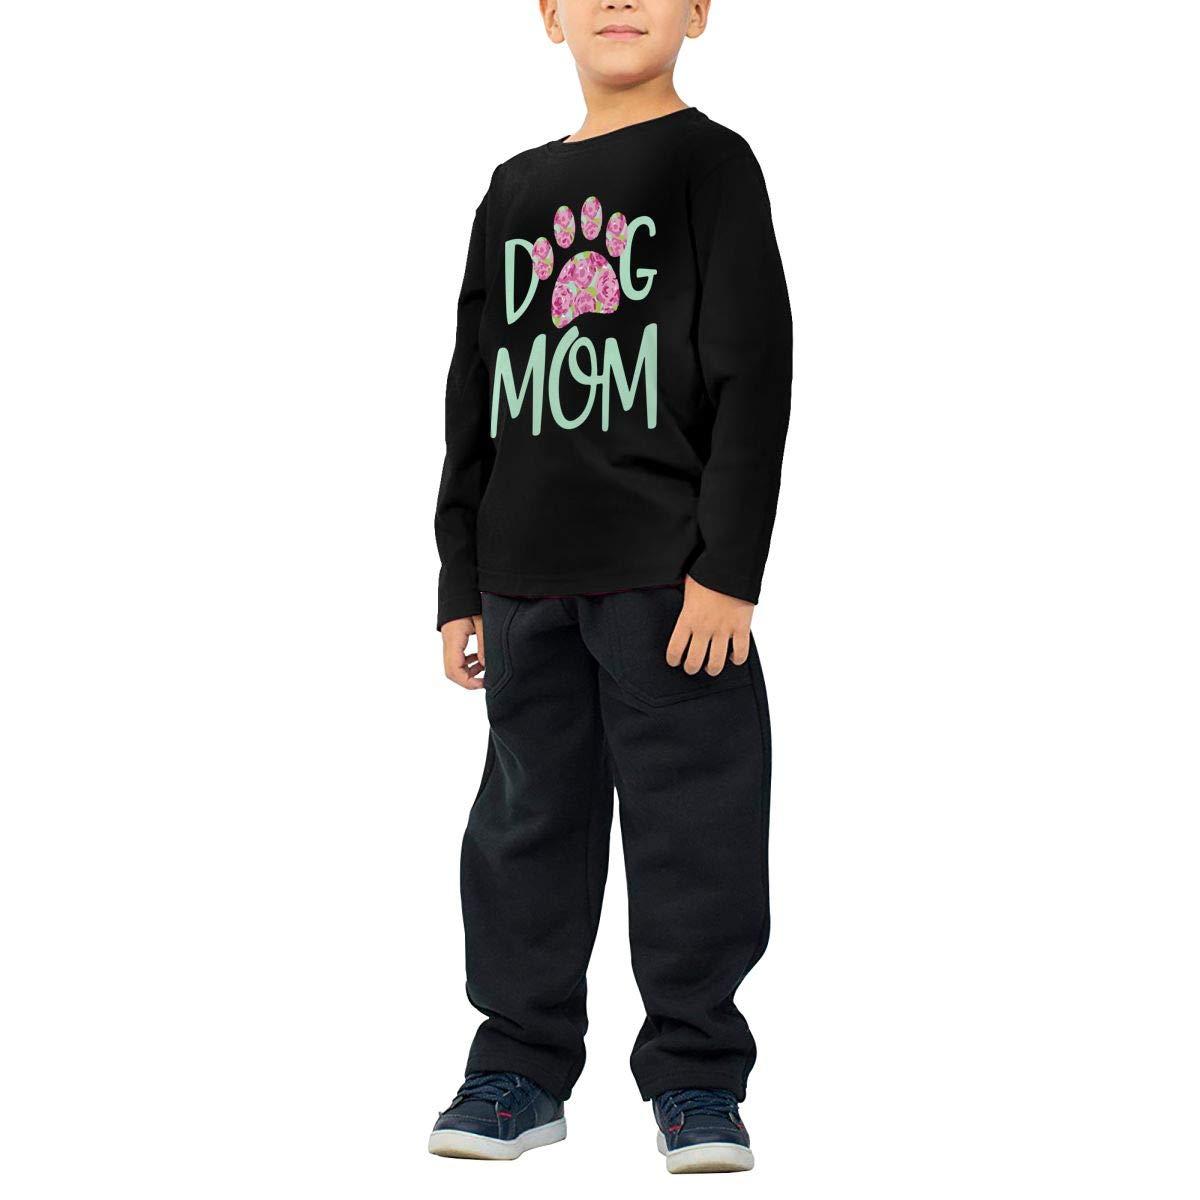 Fryhyu8 Baby Boys Childrens Dog Mom Printed Long Sleeve 100/% Cotton Infants Tee Shirt